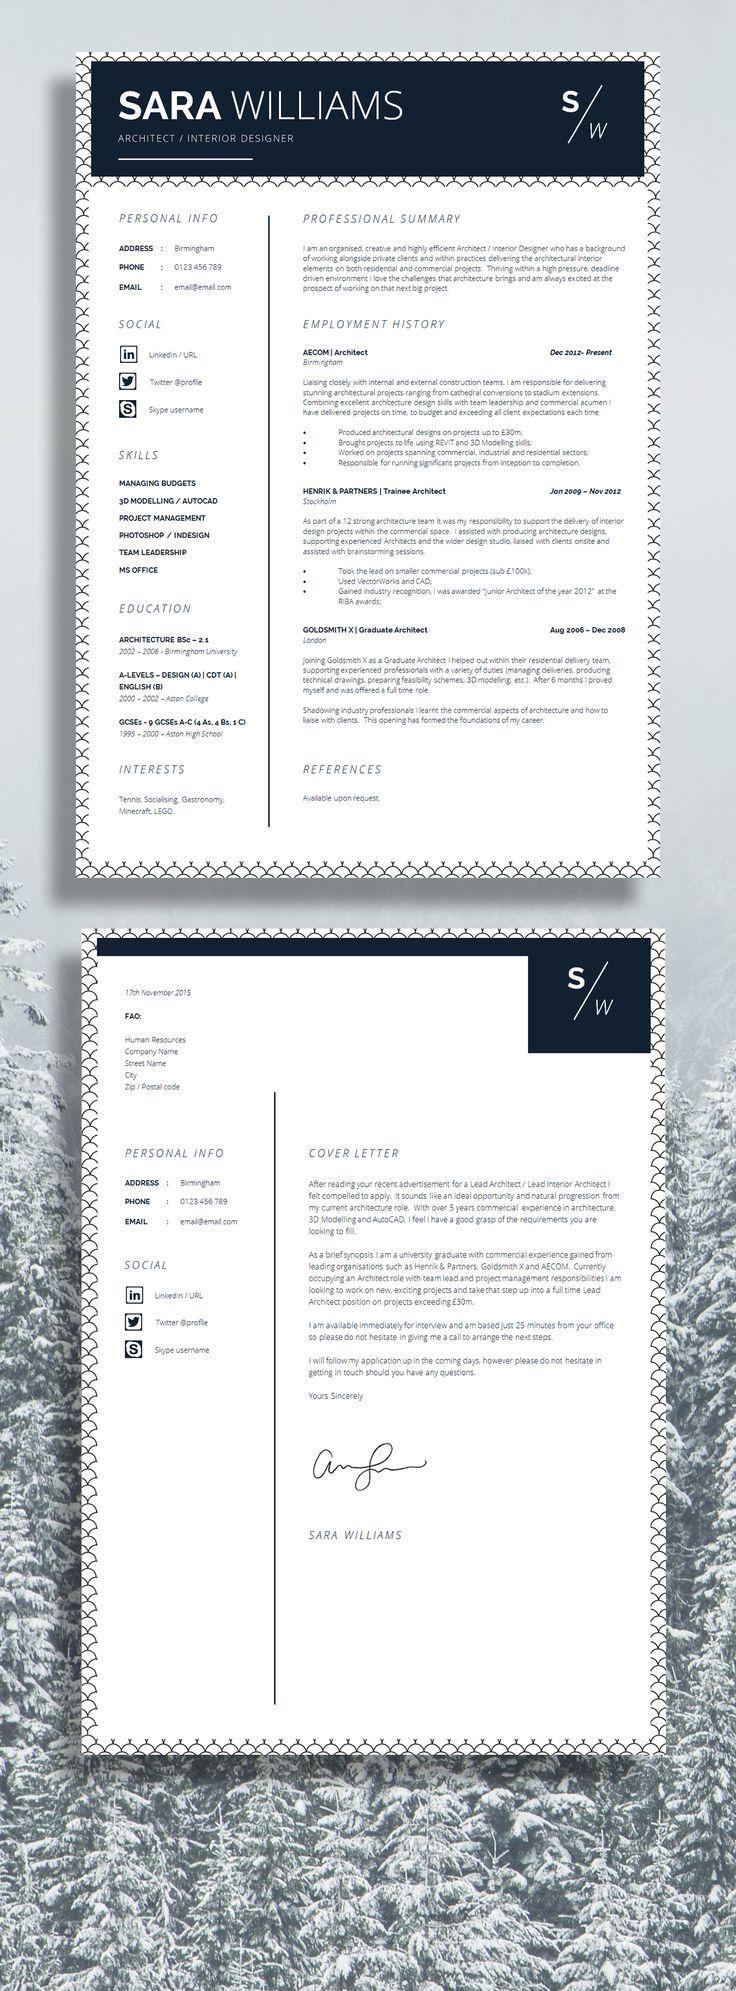 Sara Williams Architect CV / Resume - A Professional…  #resume #template #2017